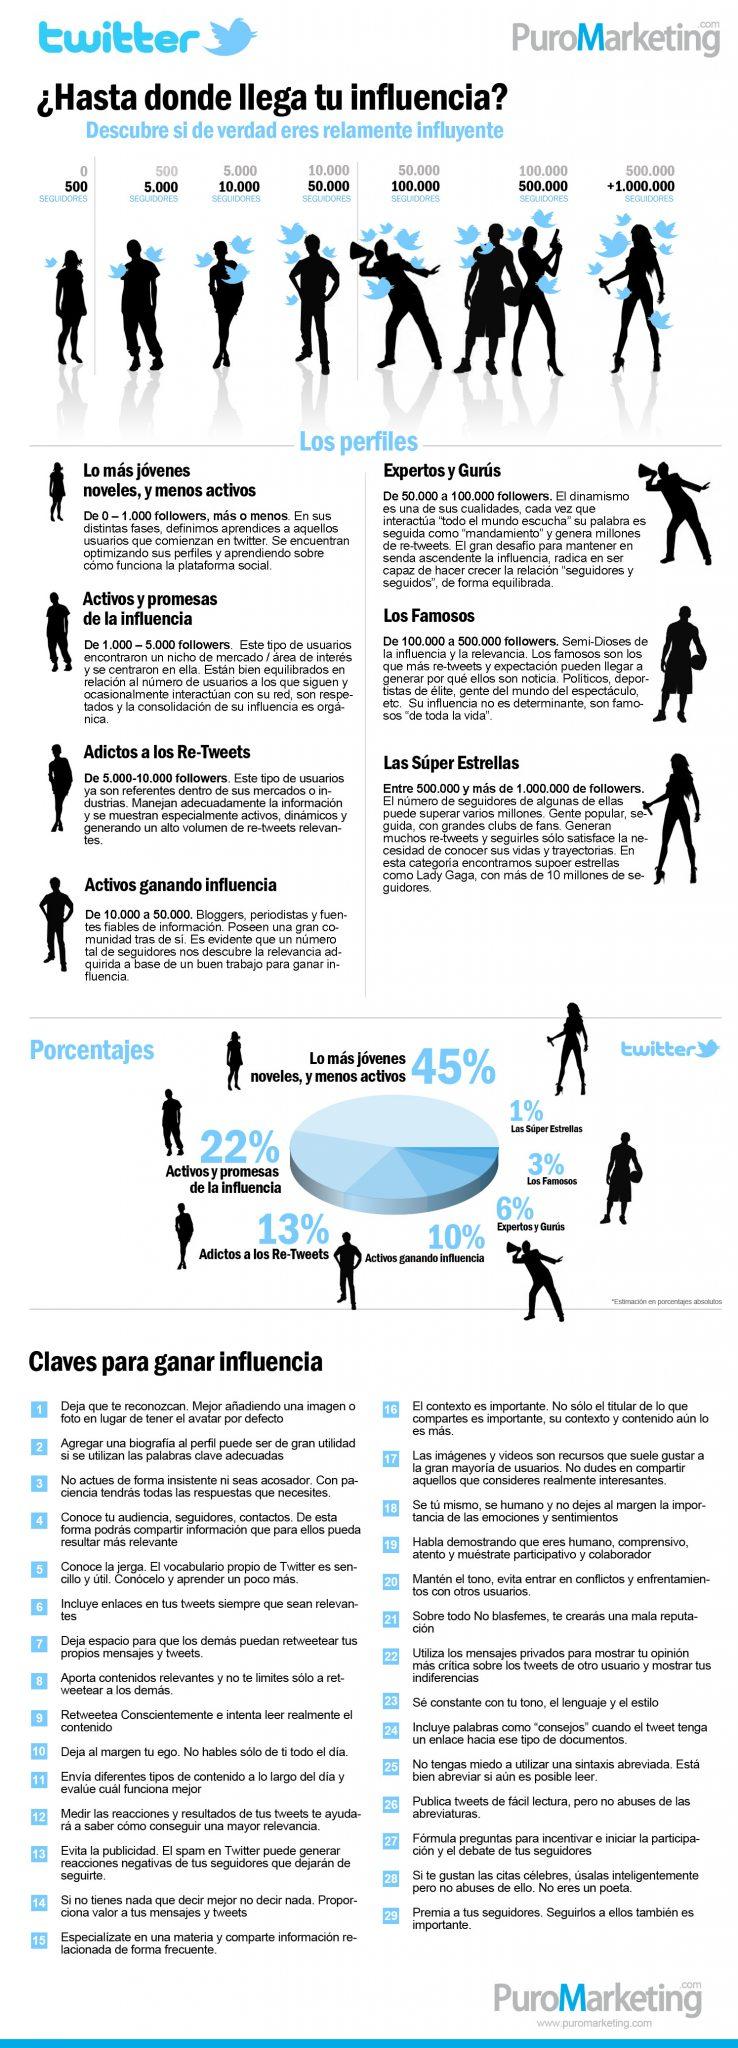 #Infografía Hasta donde llega tu Influencia en twitter?